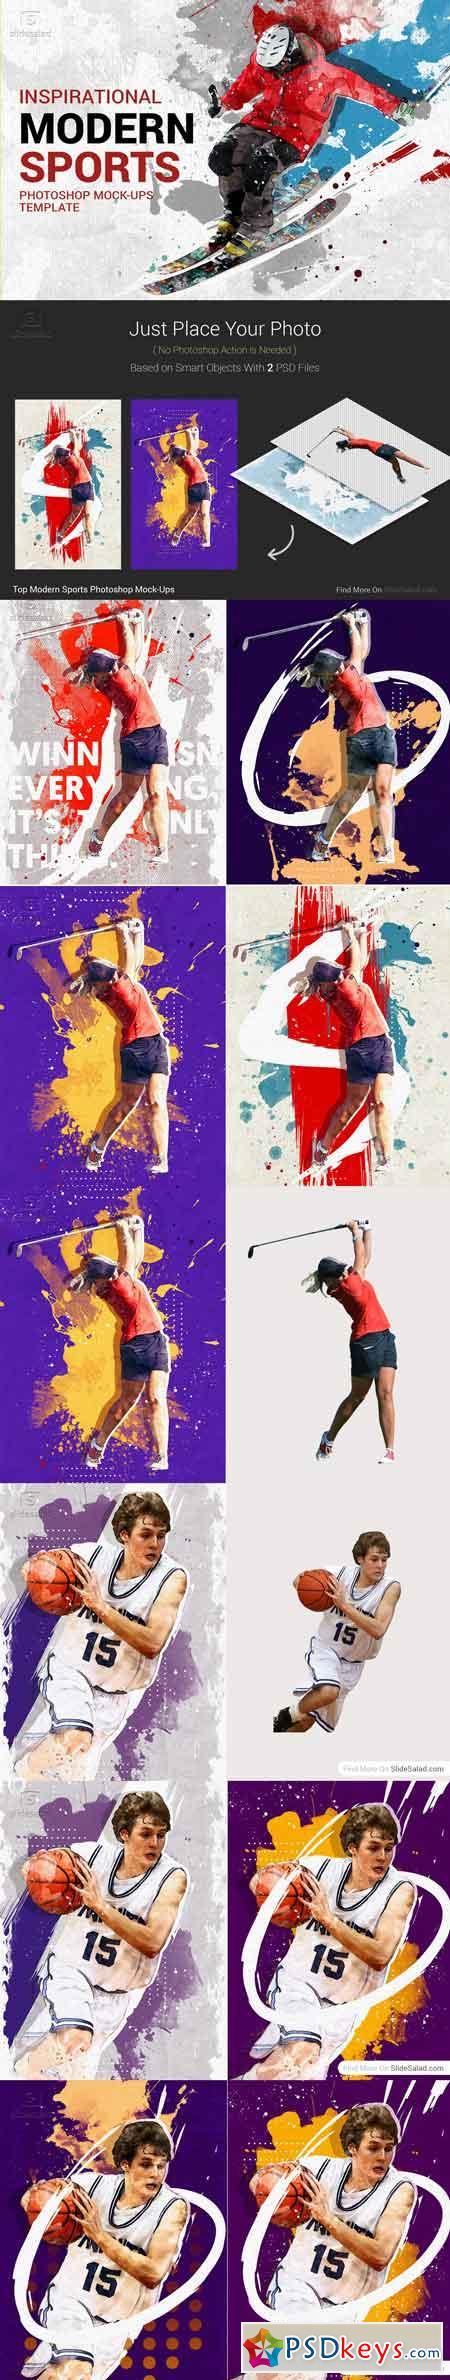 Top Modern Sports Photoshop Mock-Ups 3324367